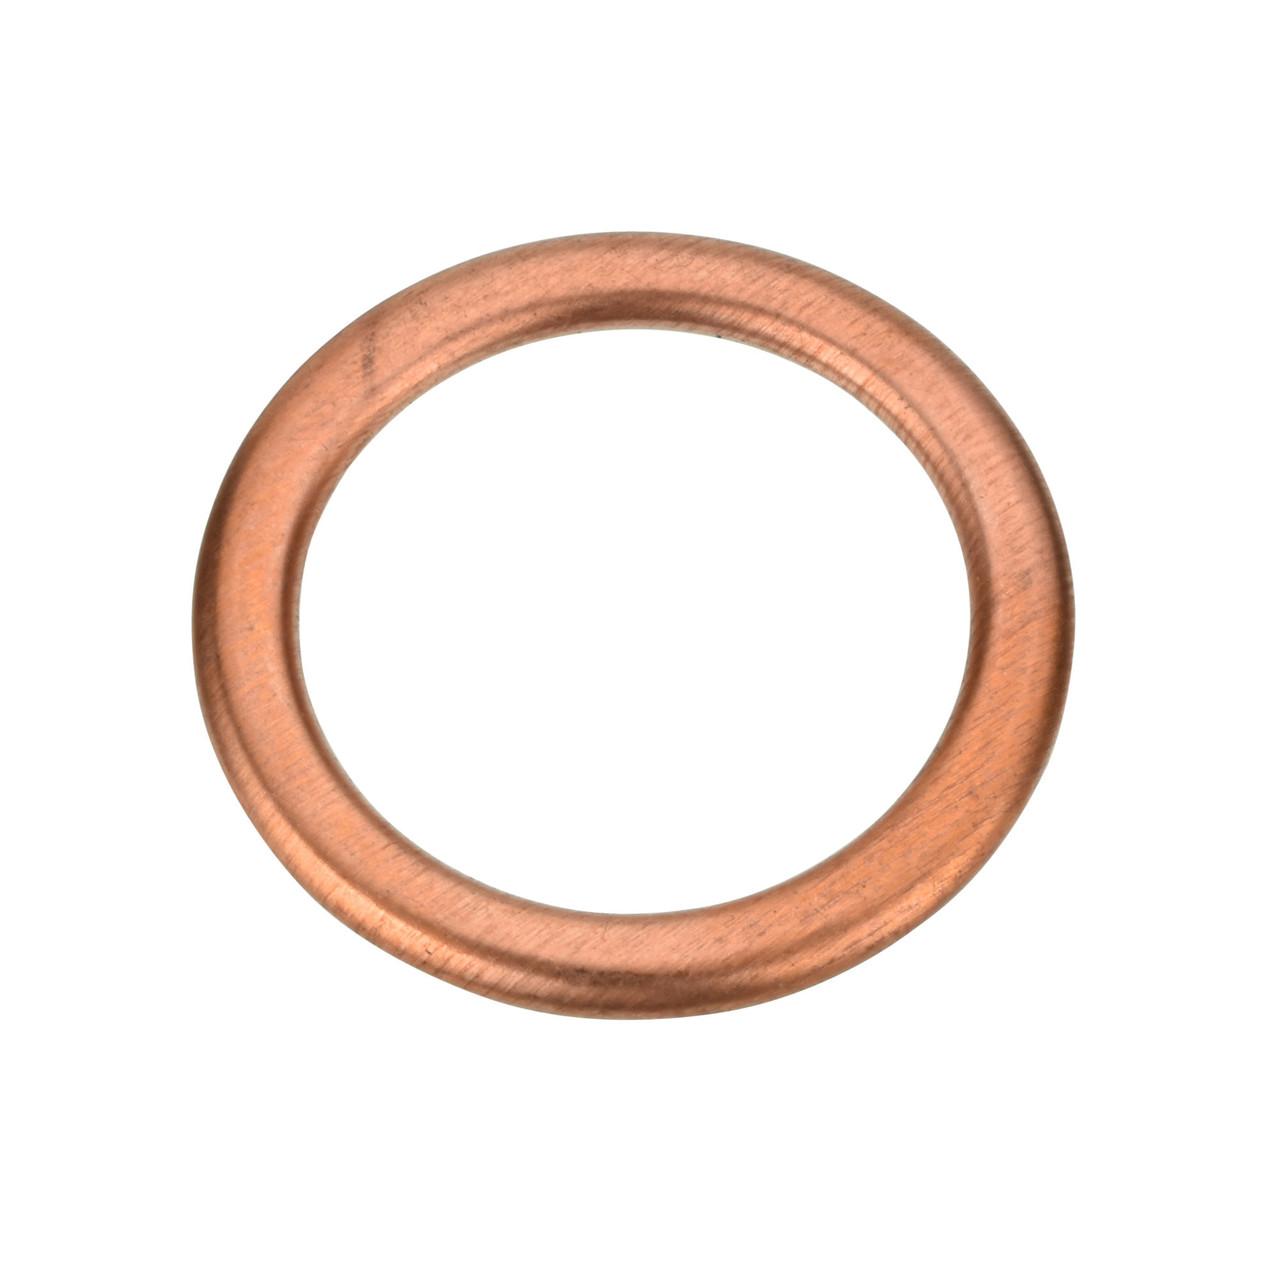 M16 Copper Oil Drain Plug Crush Gasket - Interchanges: Nissan 11026-00QAB